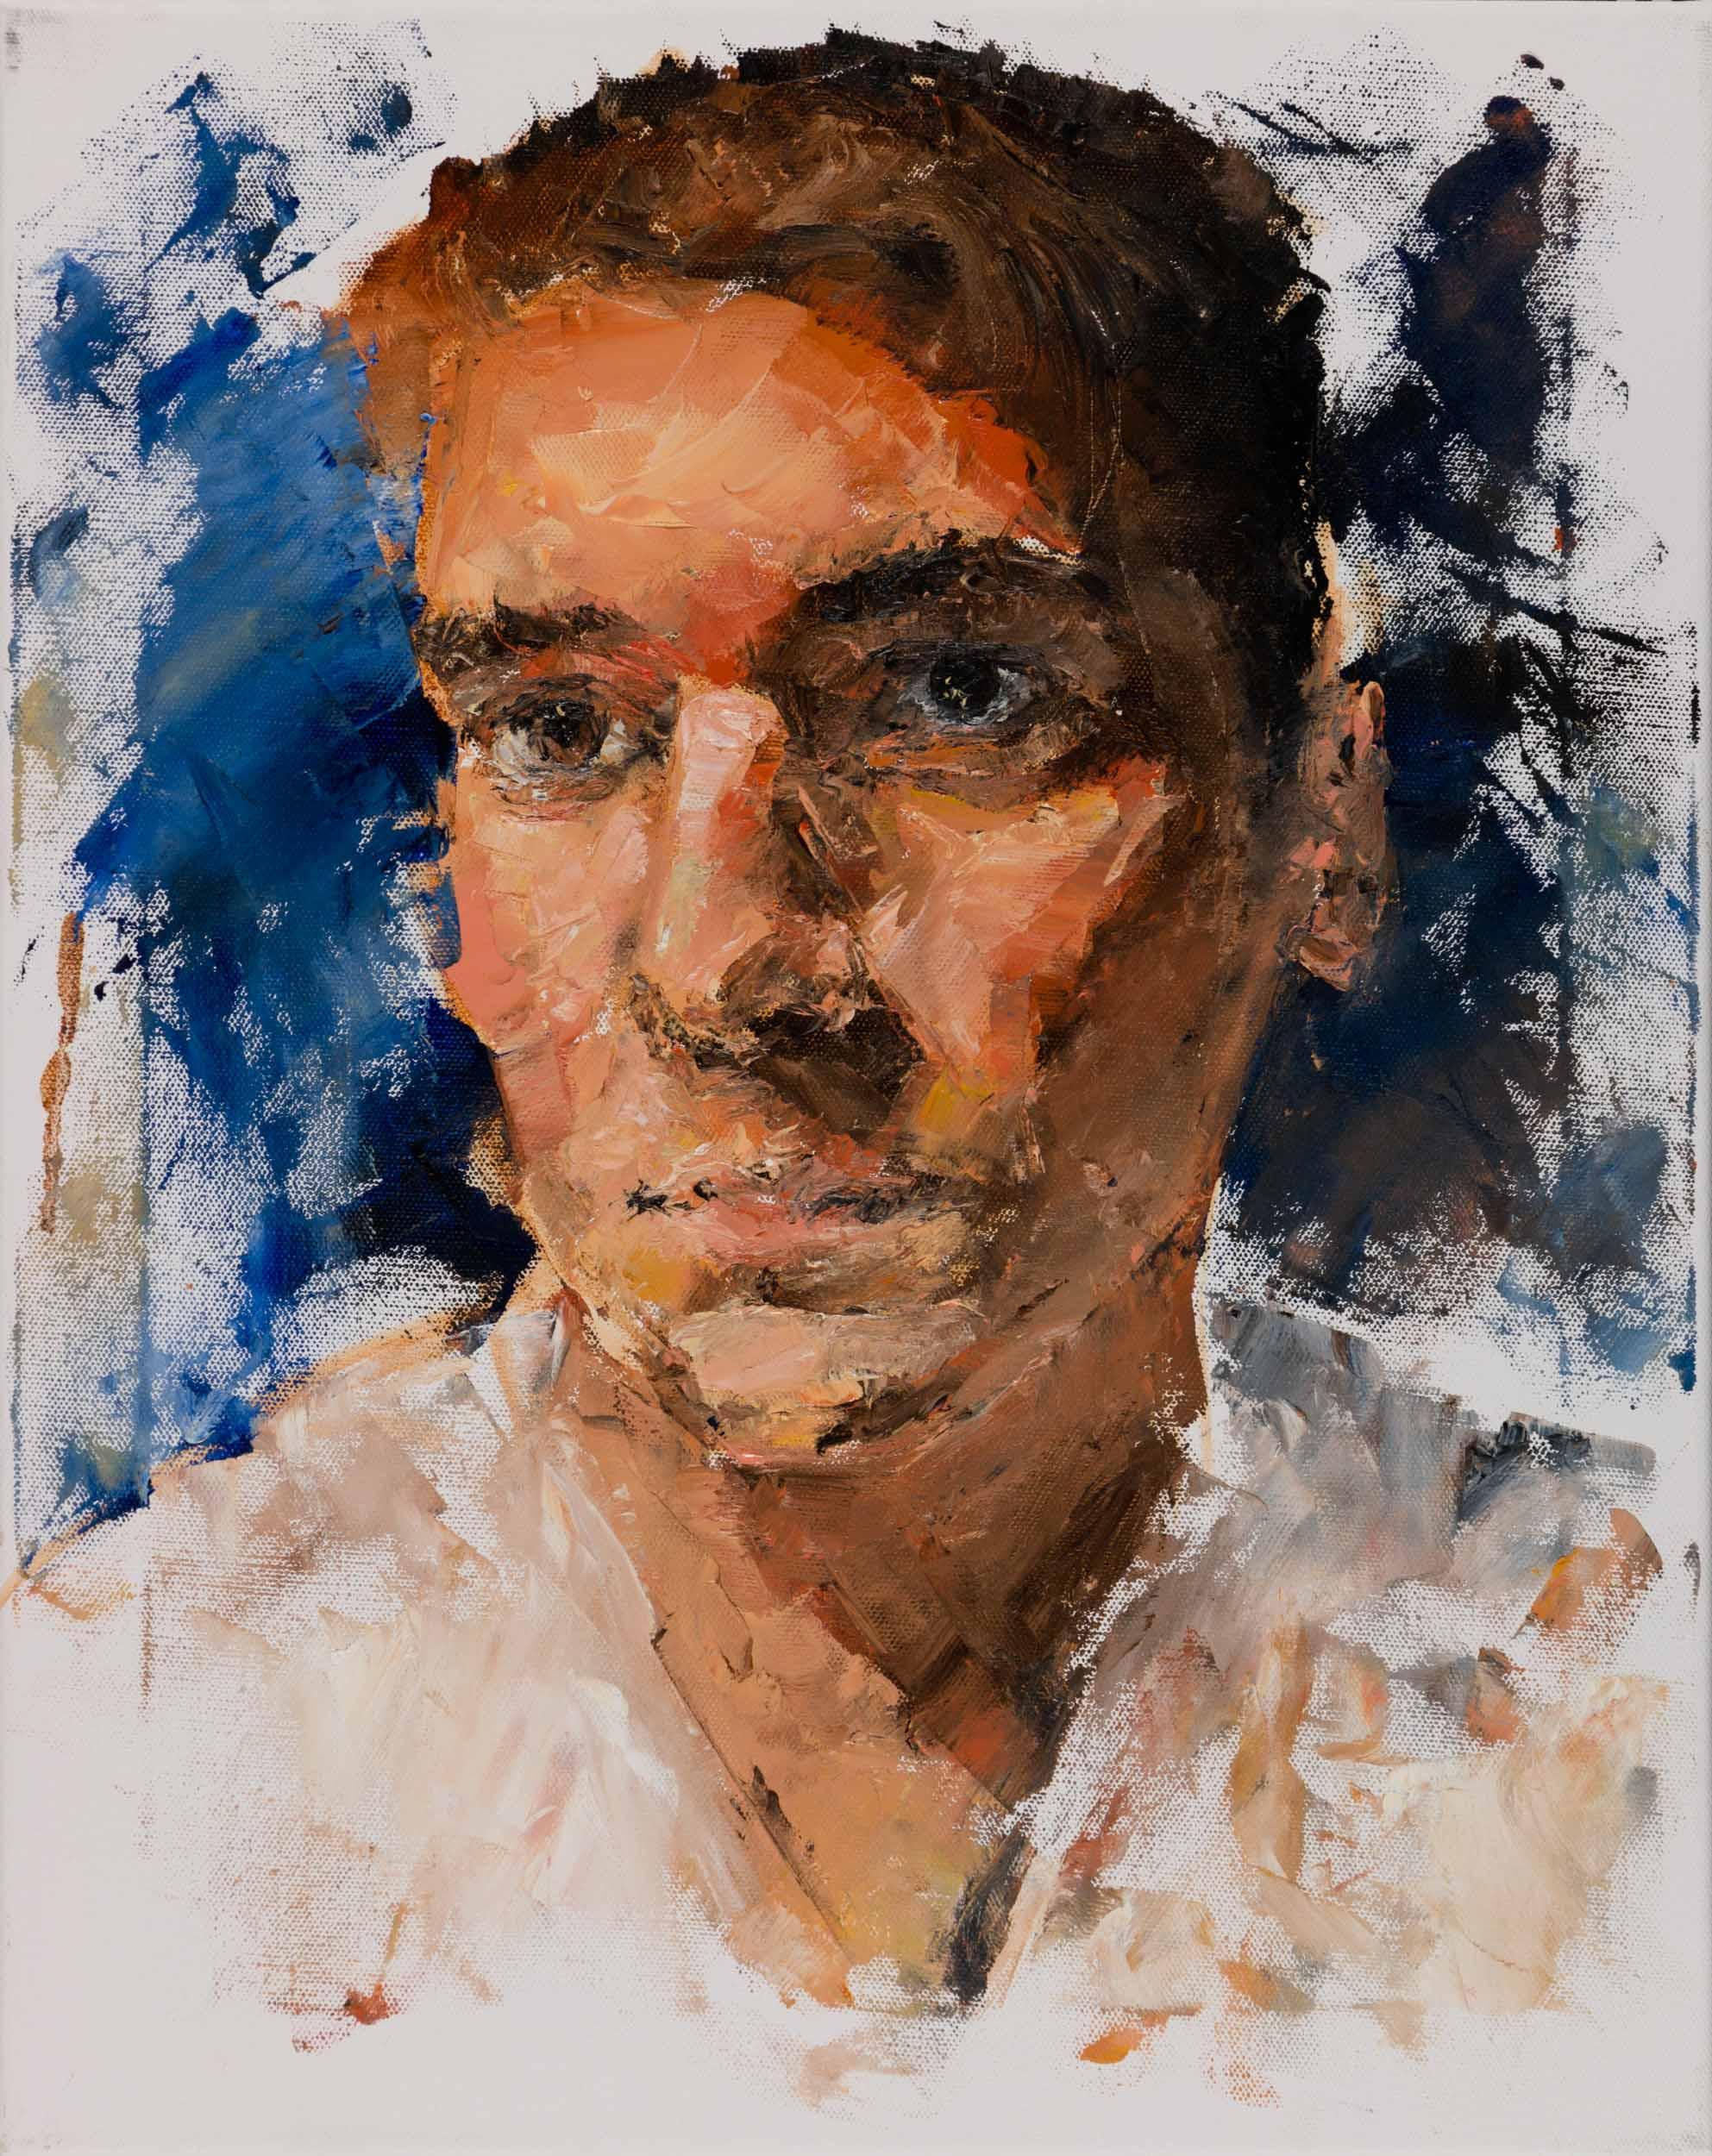 Diafacies - Self Portrait by Koko Deranteriassian